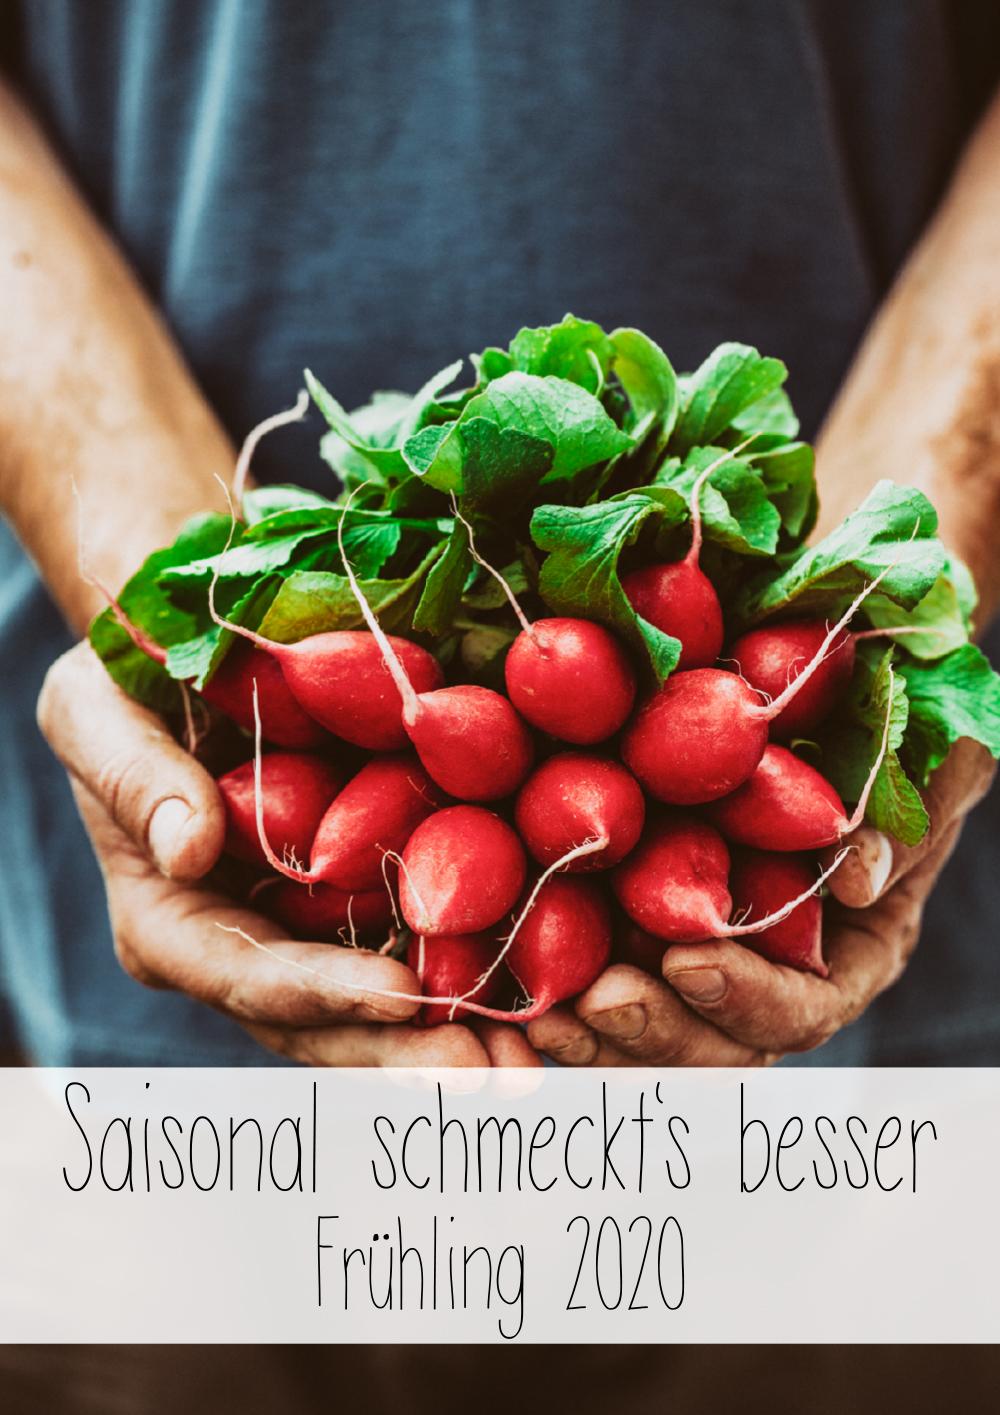 Saisonal-schmeckts-besser-fruehling-2020